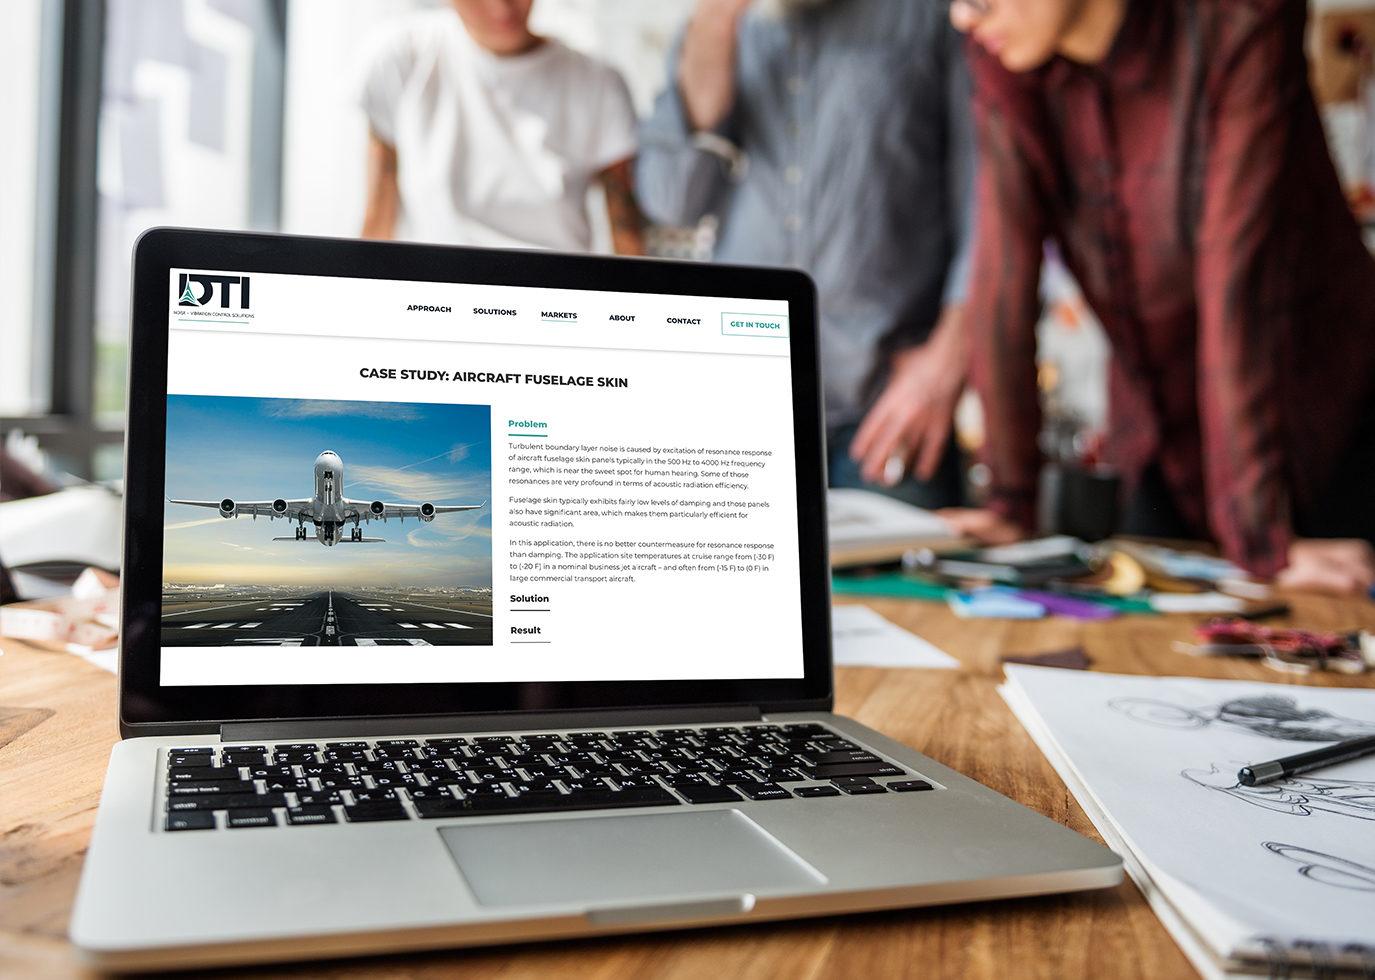 DTI Site on laptop